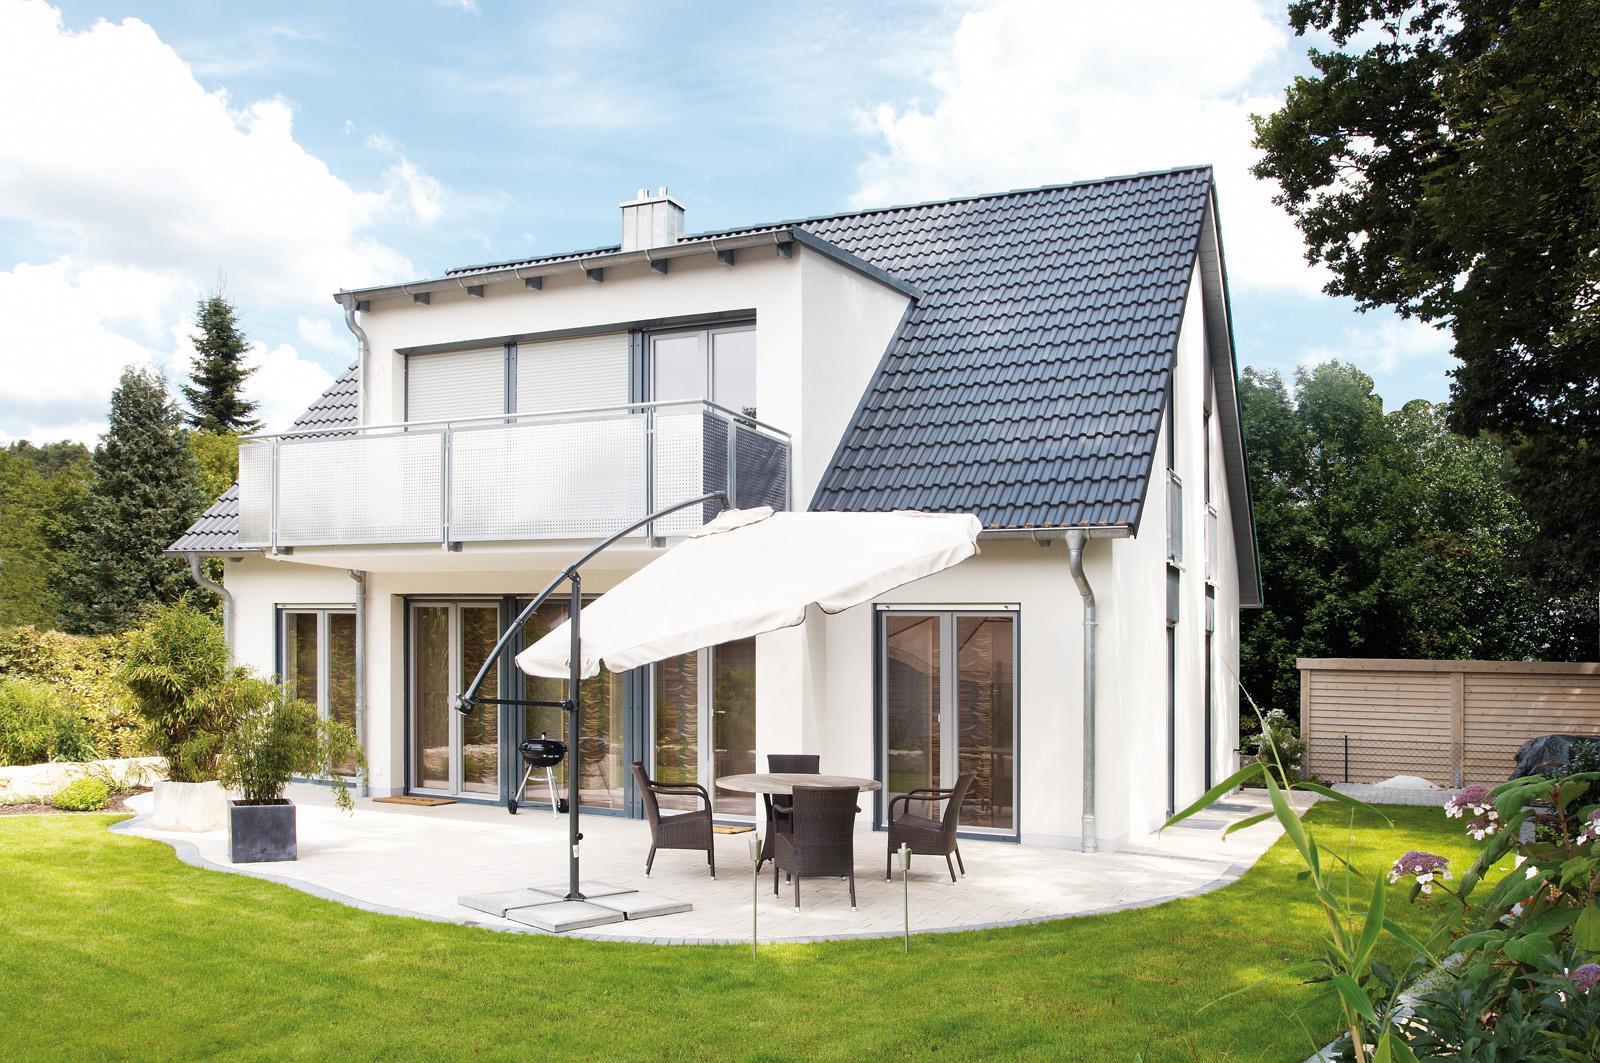 doppelhaushälfte • bilder & ideen • couchstyle, Garten ideen